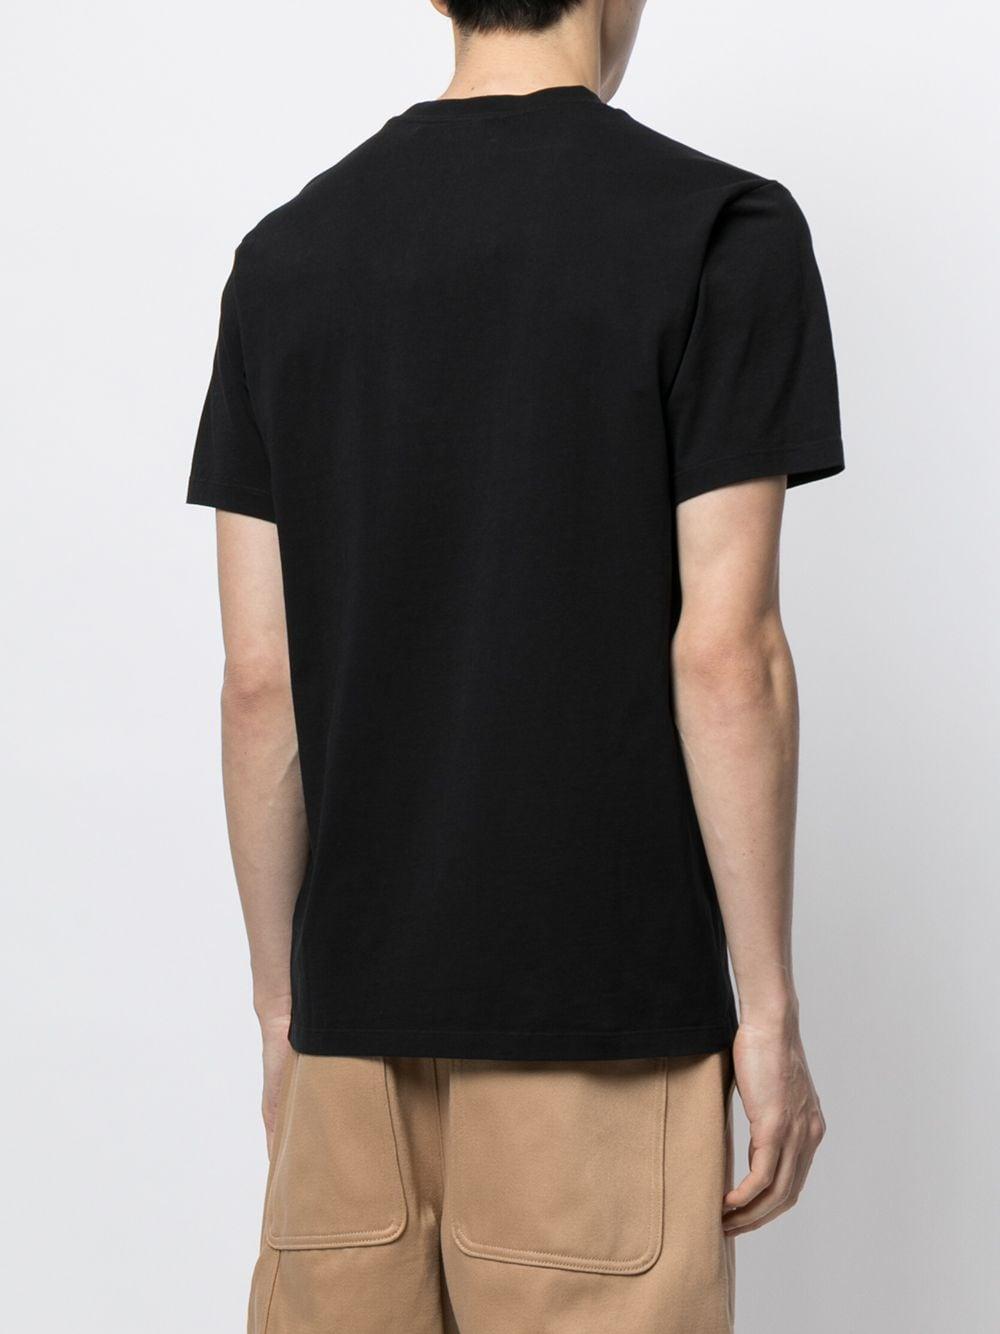 logo t-shirt man black in cotton KENZO   T-shirts   FB65TS0204YA99